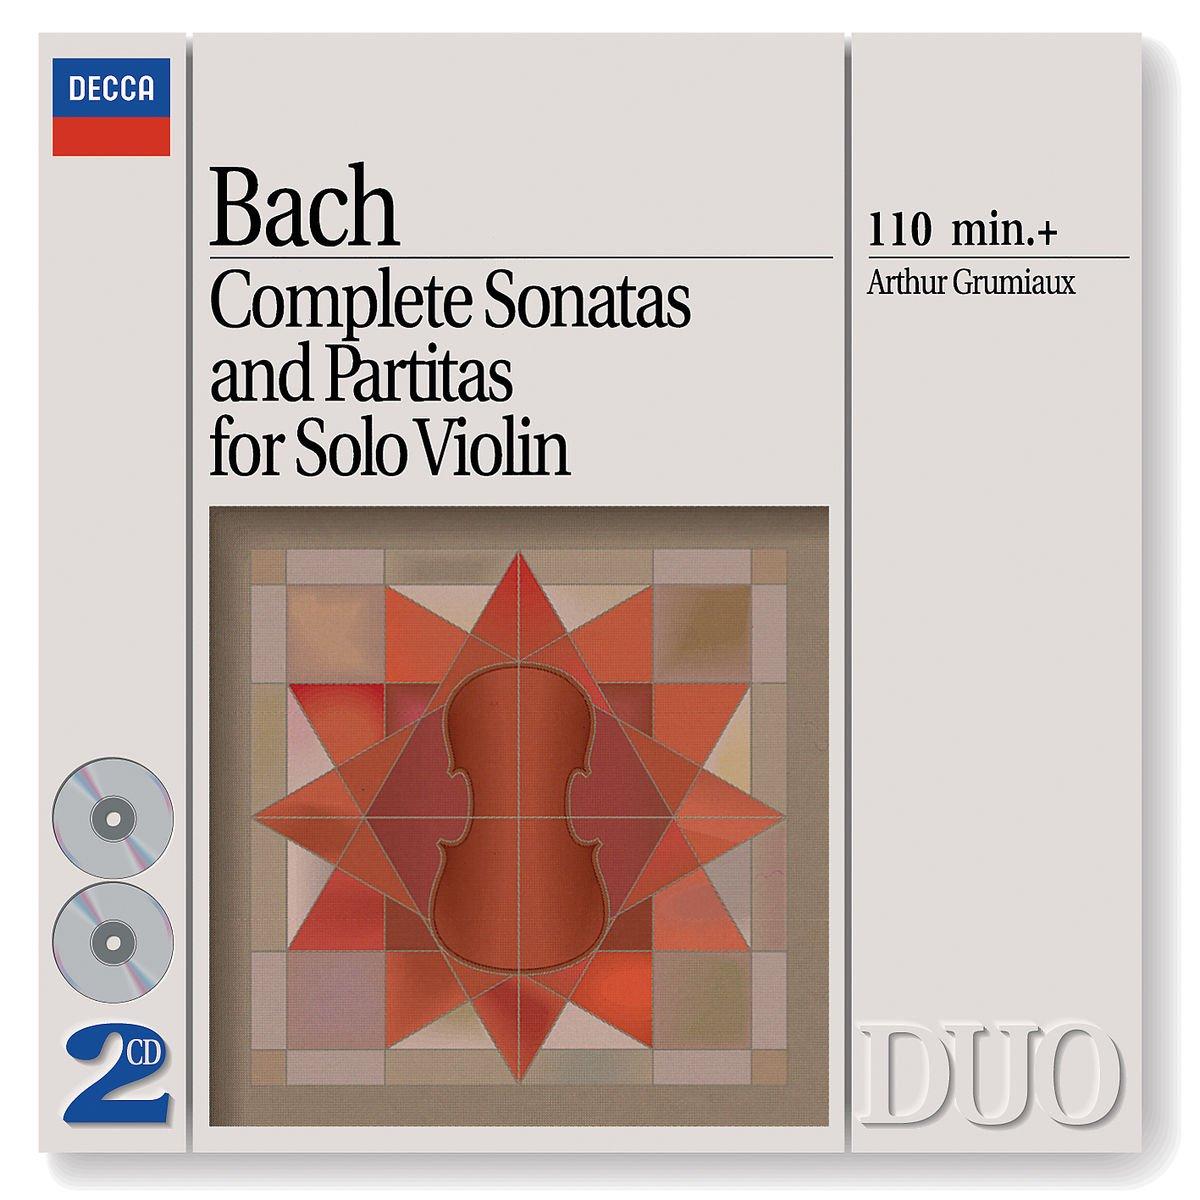 Bach: Complete Sonatas and Partitas for Solo Violin